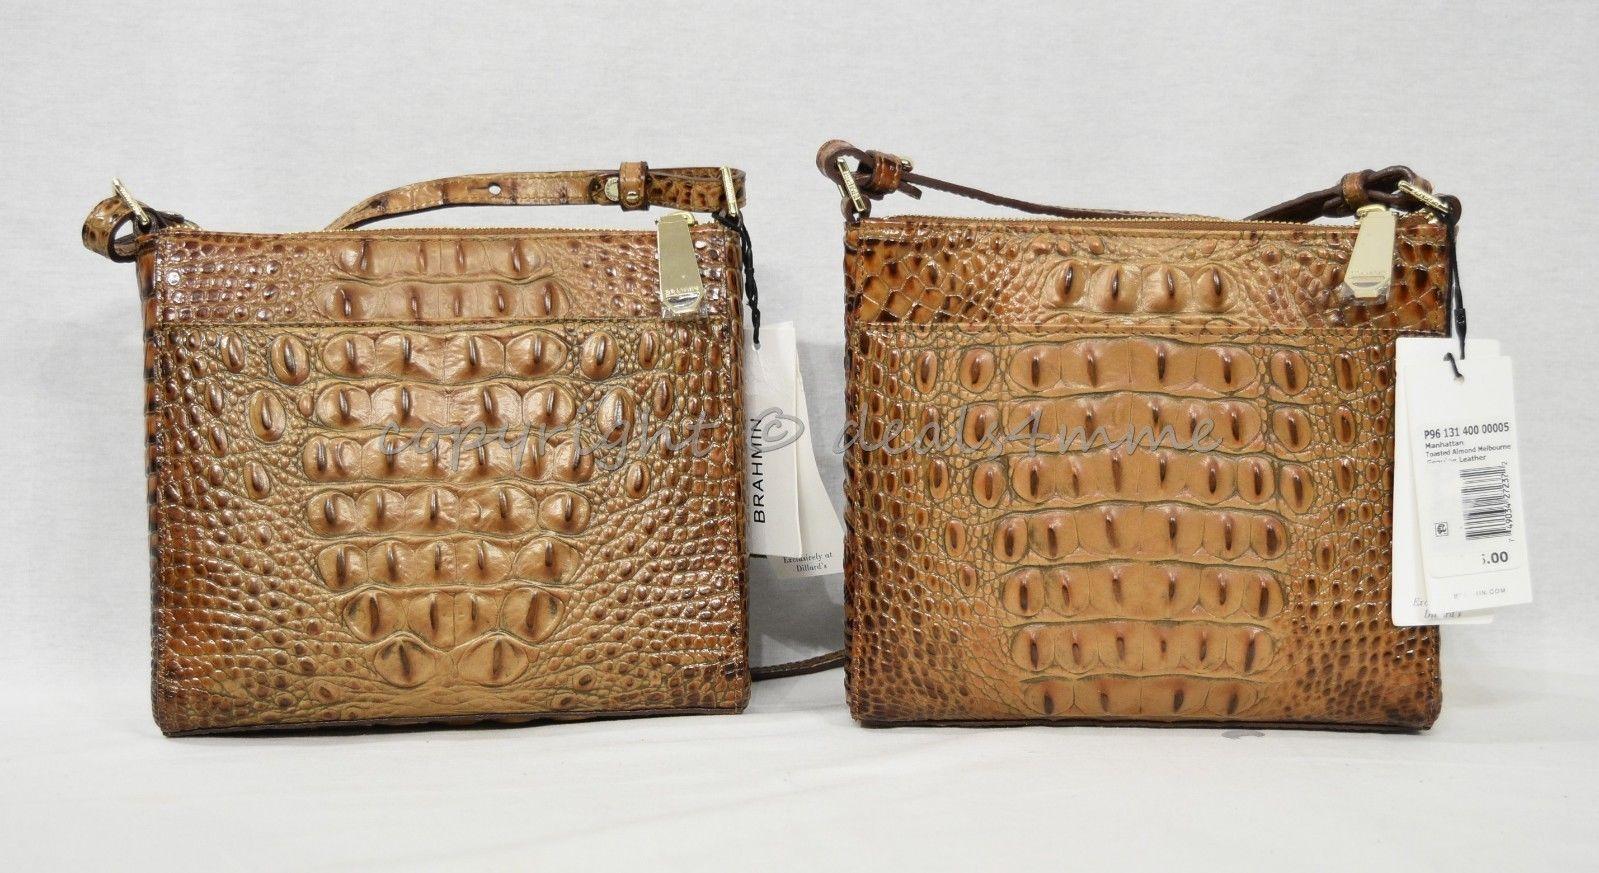 NWT Brahmin Manhattan Leather Shoulder/Crossbody Bag in Toasted Almond Melbourne image 12